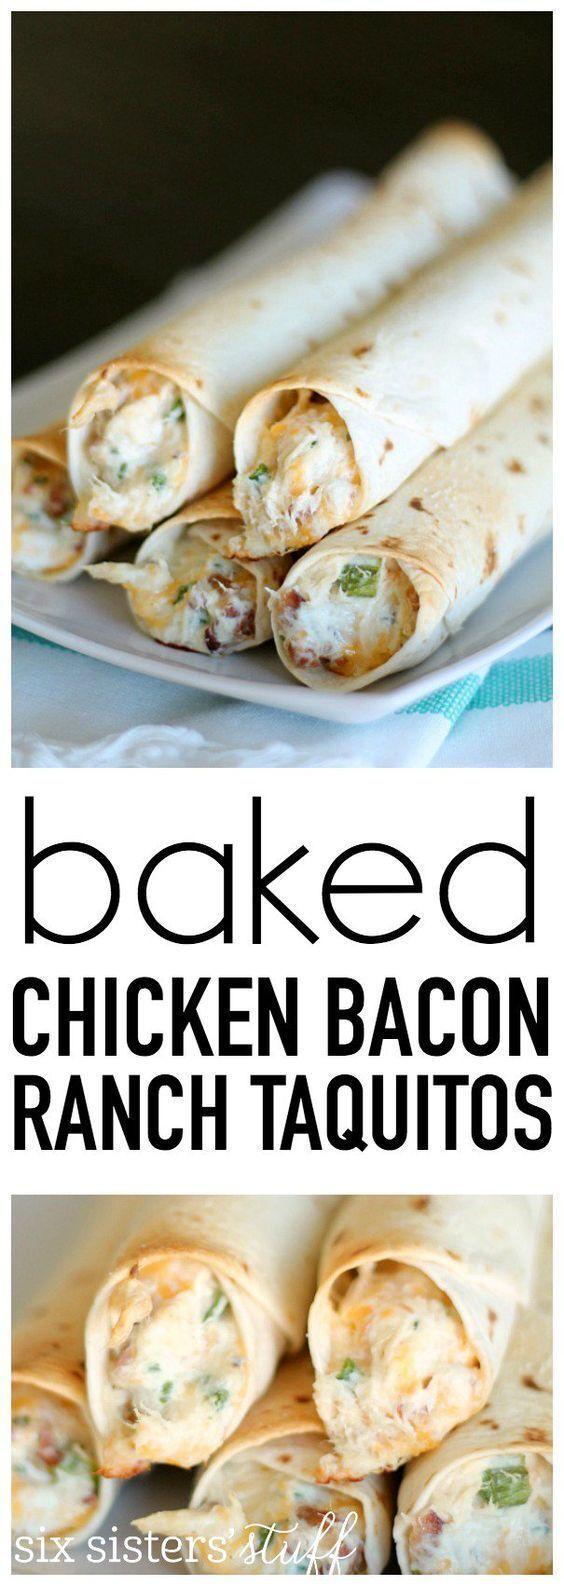 Baked Chicken Bacon Ranch Taquitos